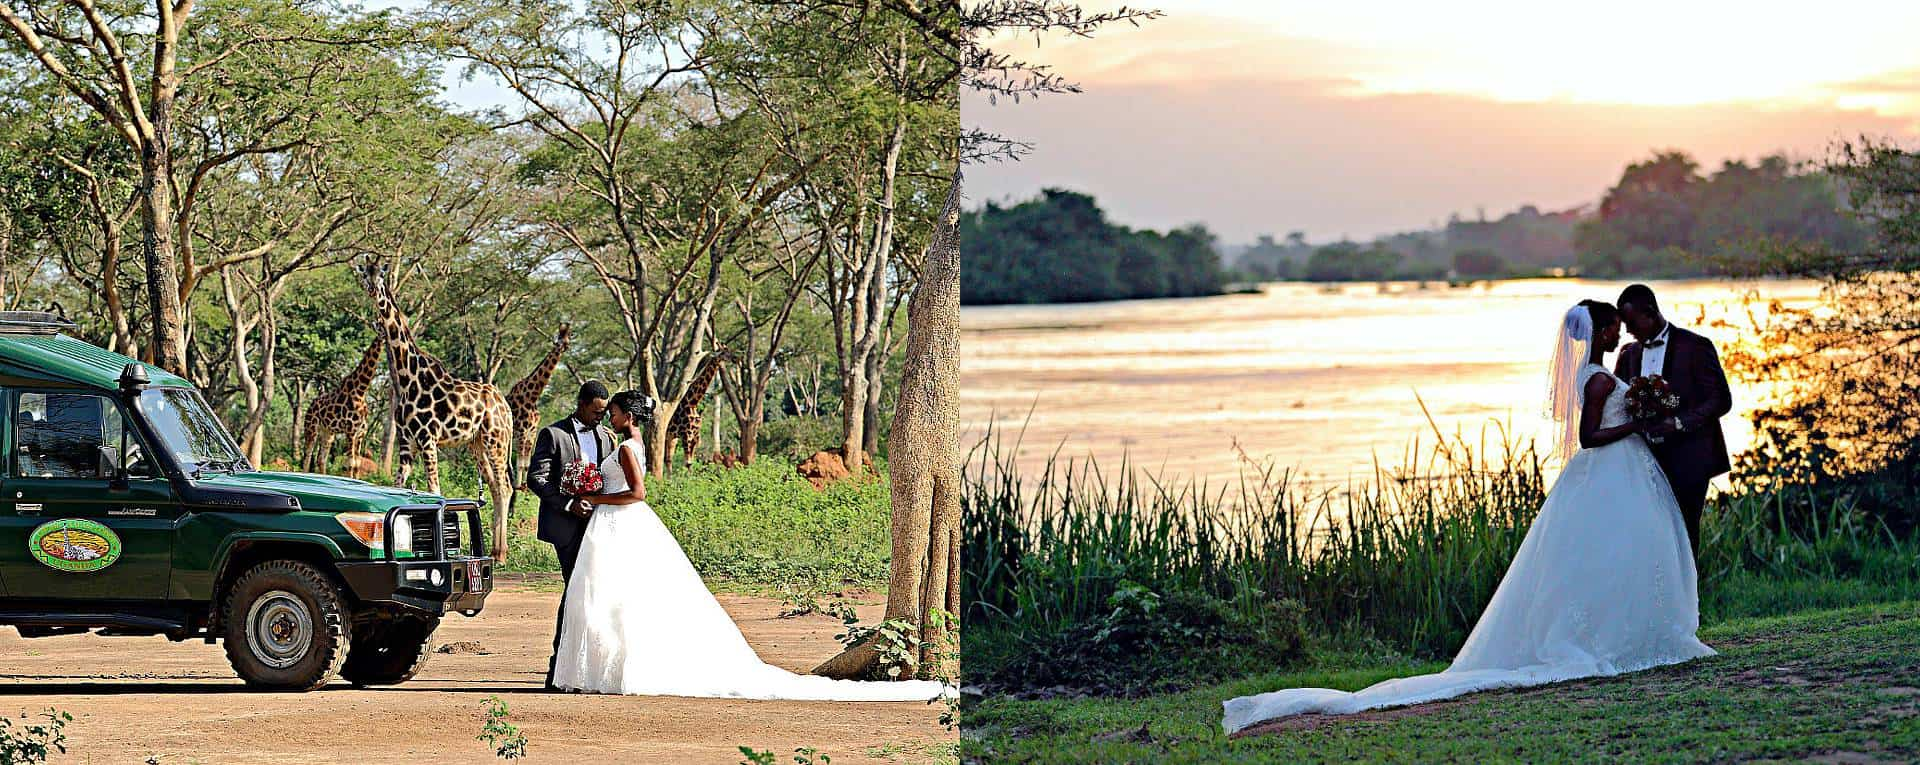 Wedding Safaris Trip Planning Guide For Uganda